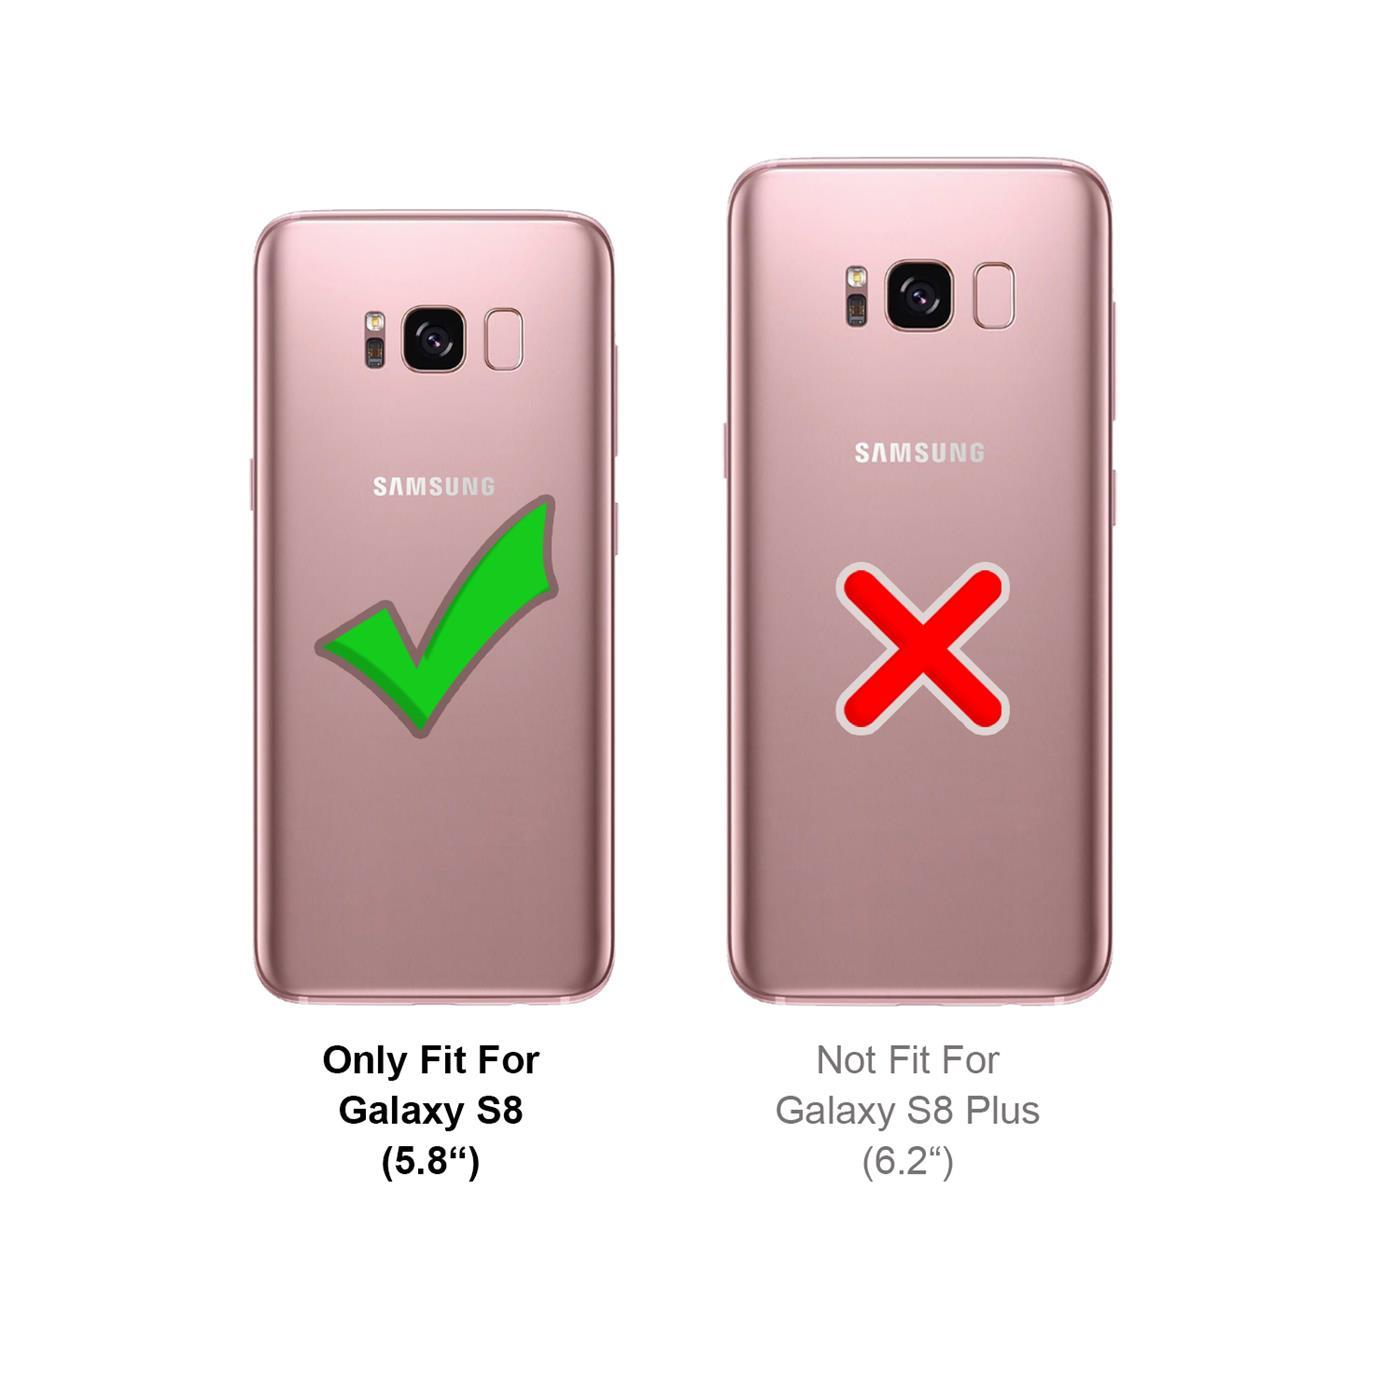 Hard-Back-Case-Cover-Samsung-Galaxy-j3-2016-duenn-Cover-Slim-Shockproof-Rugged Indexbild 19